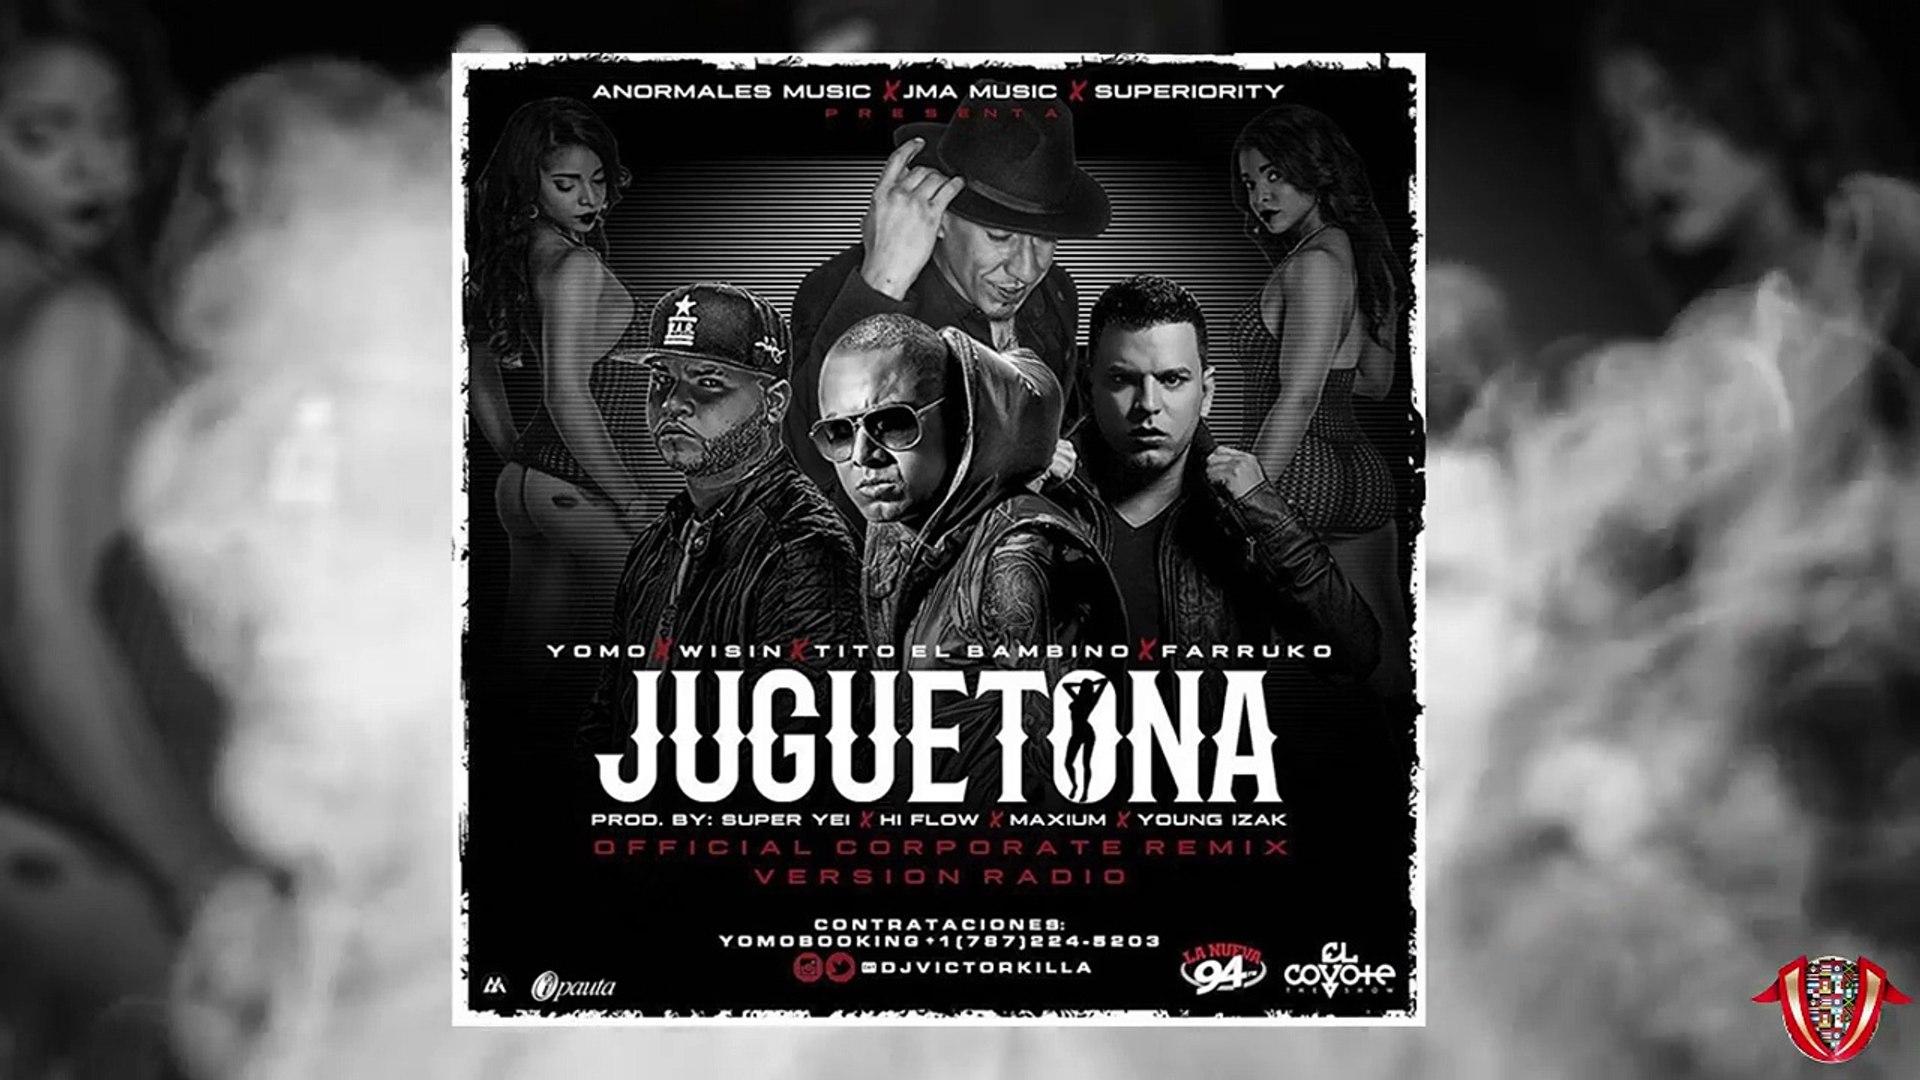 Juguetona Remix - Farruko Ft Wisin, Yomo, Tito El Bambino  [Oficial Audio]